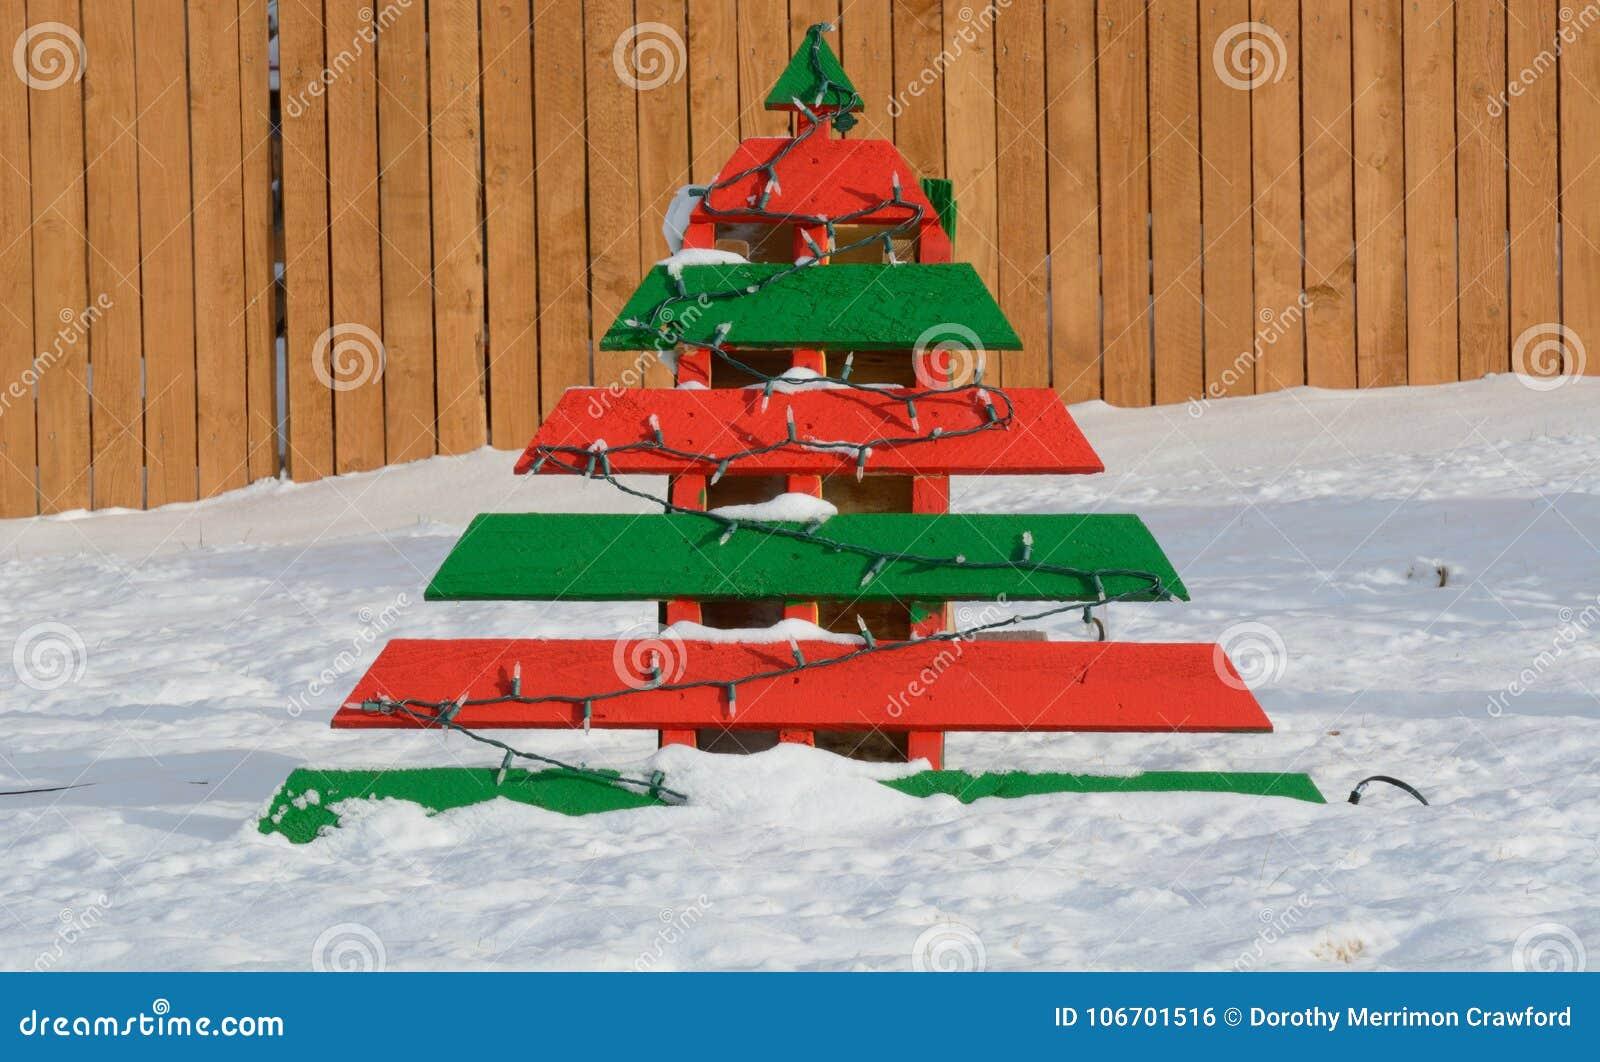 Homemade Christmas Tree Decoration Stock Photo Image Of Xmas Symbol 106701516